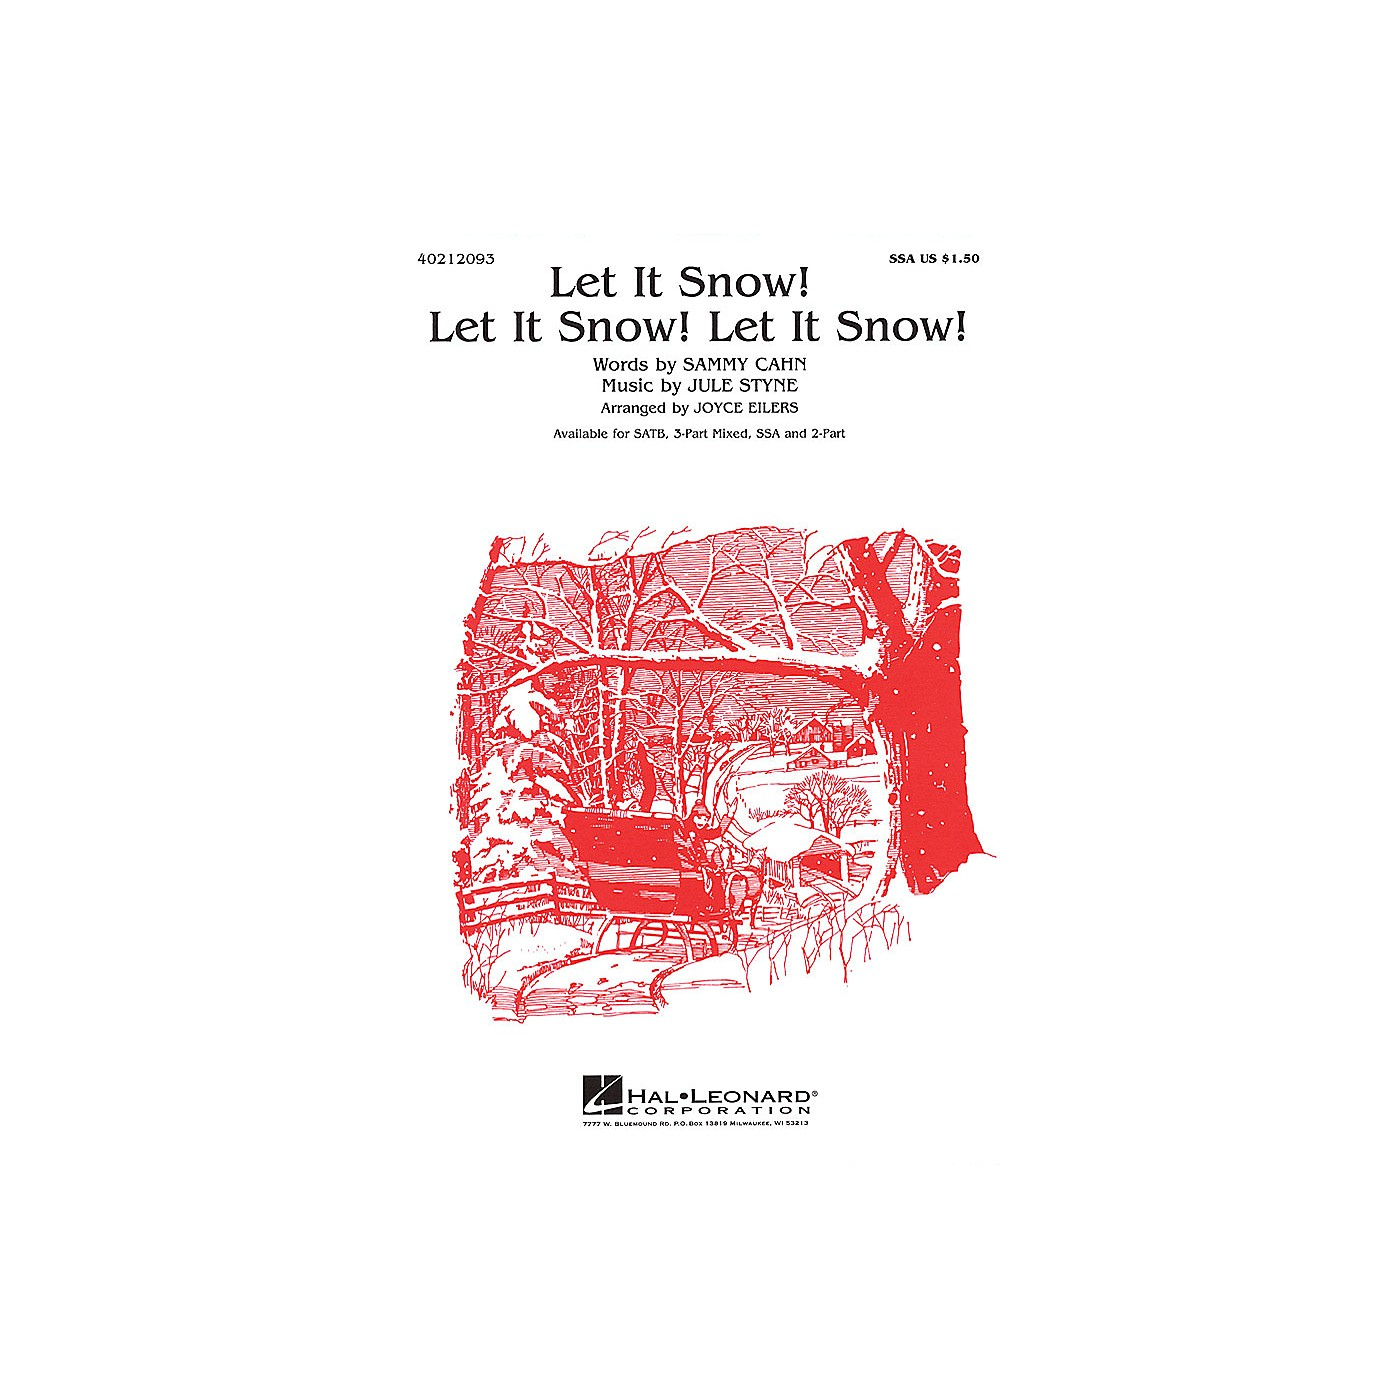 Hal Leonard Let It Snow! Let It Snow! Let It Snow! (SATB) SATB Arranged by Joyce Eilers thumbnail